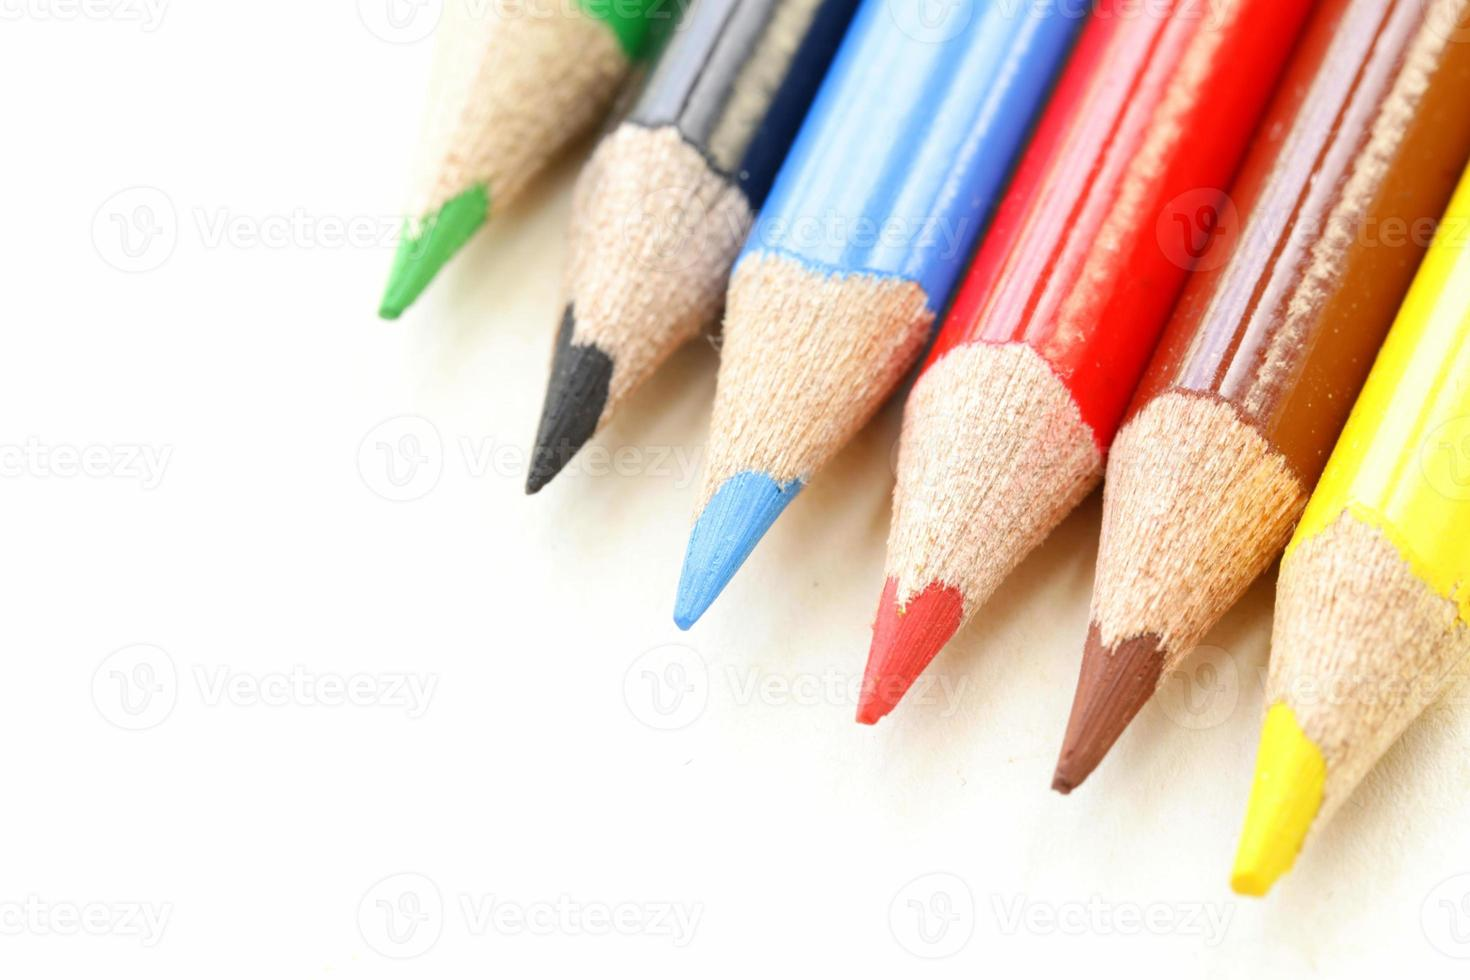 lápis de cor multicoloridos sobre um fundo branco foto